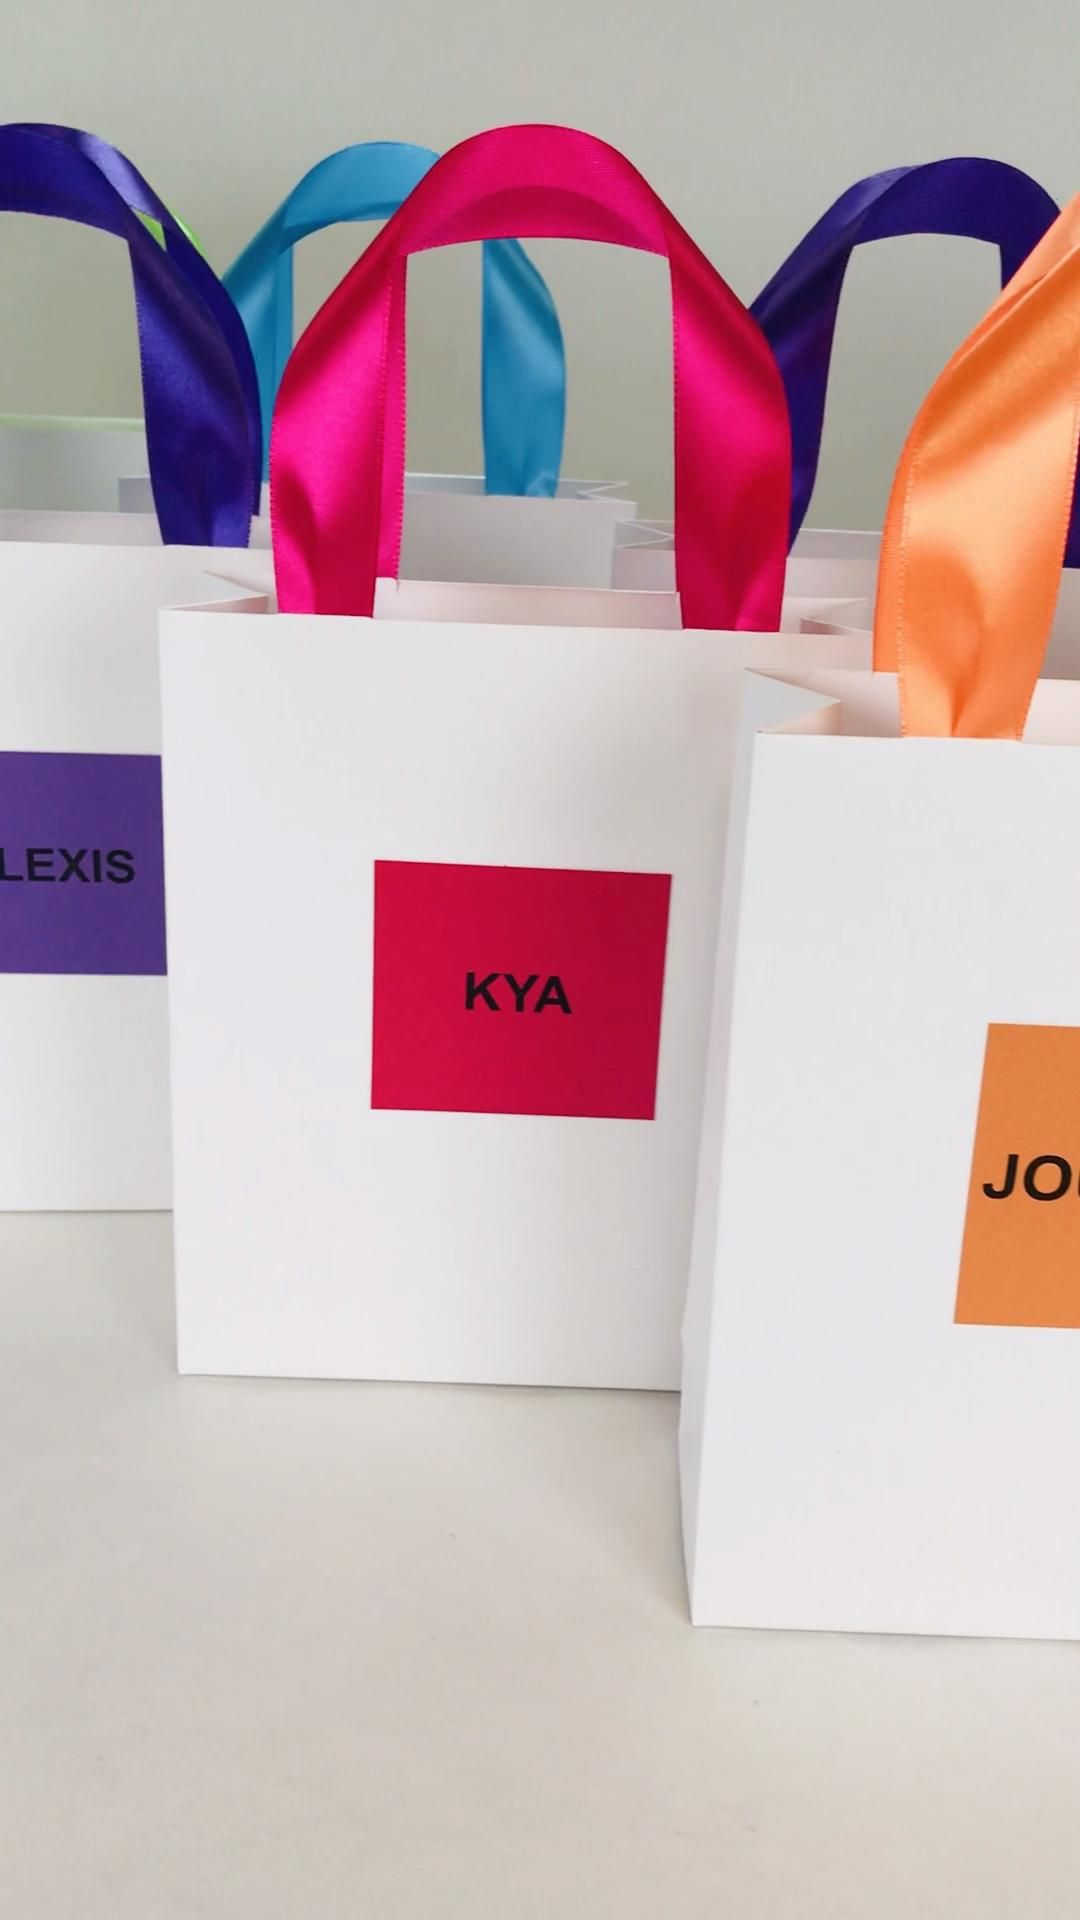 Bridesmaid S Gift Bag With Custom Names Personalized Etsy Video Video In 2020 Personalized Brides Gifts Bridesmaids Gifts Bridal Shower Favors